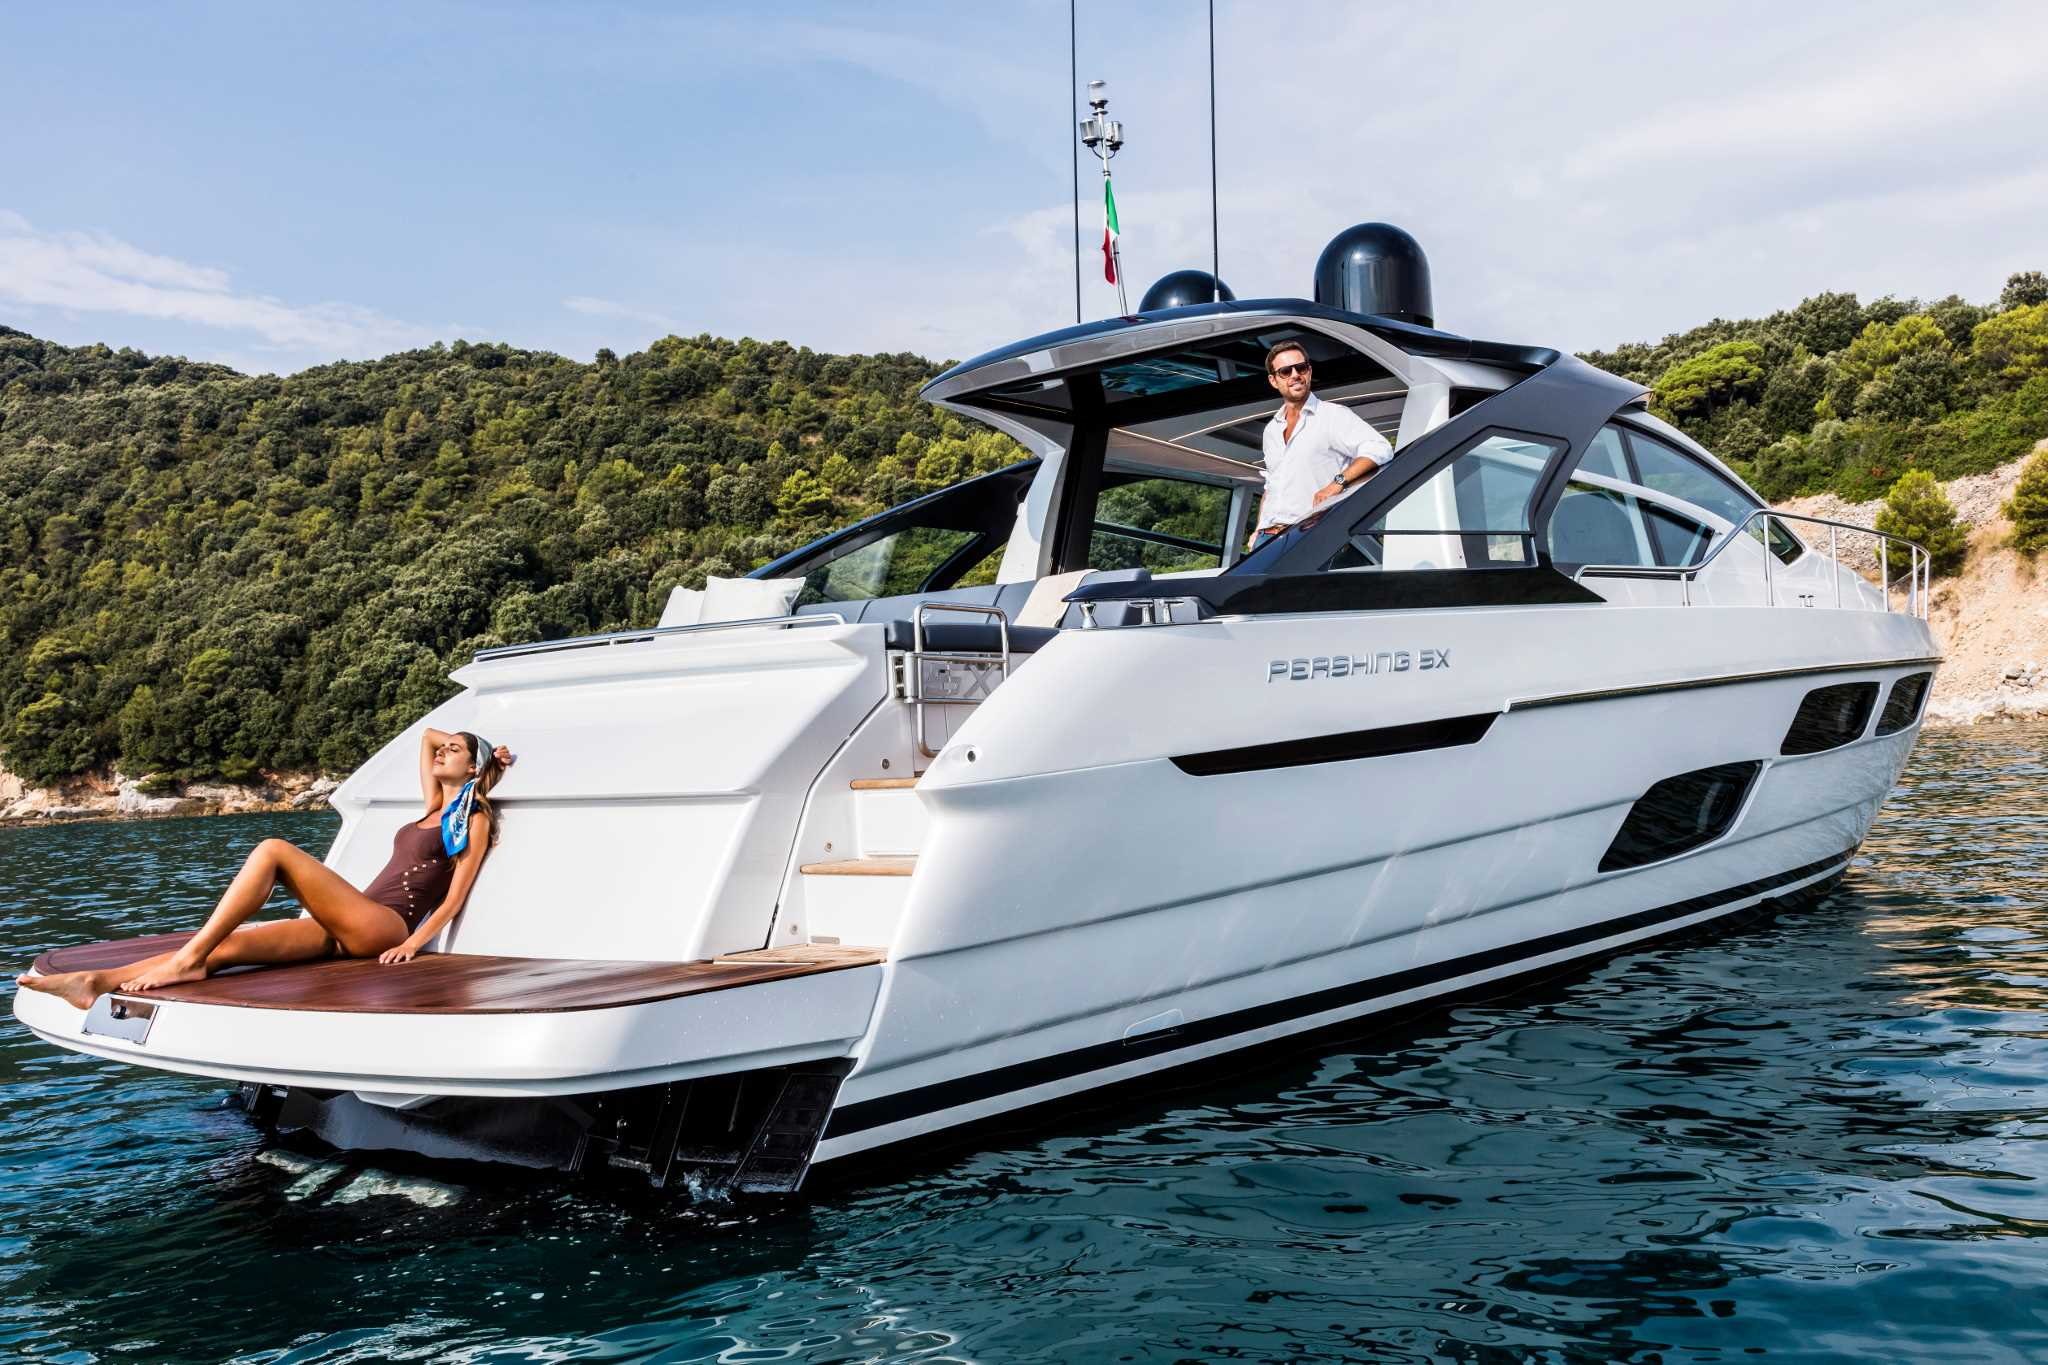 Pershing 5X, promete conquistar en el Fort Lauderdale International Boat Show